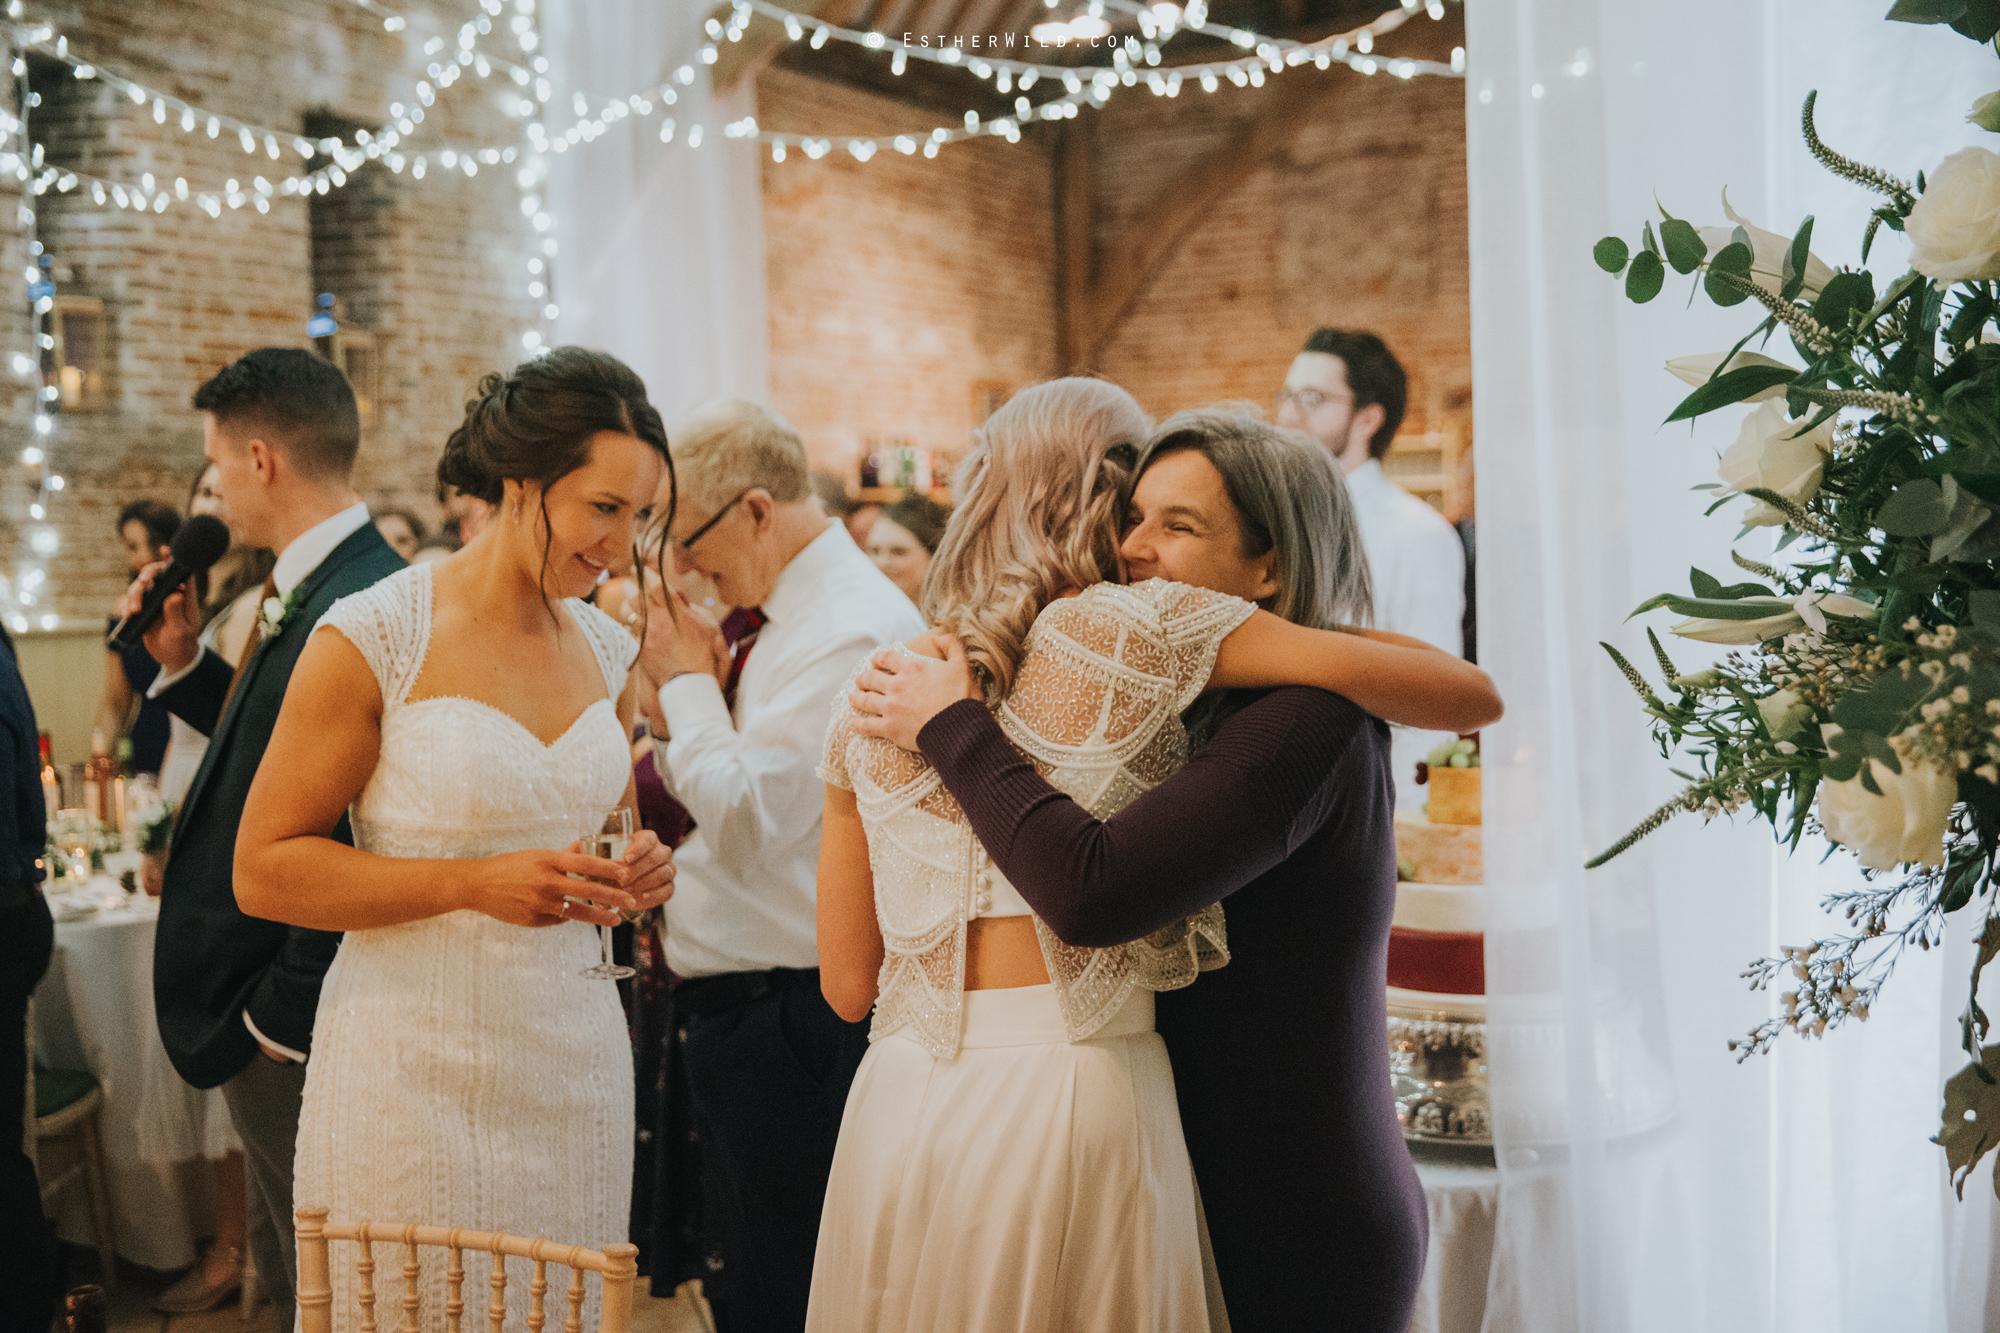 Elms_Barn_Weddings_Suffolk_Photographer_Copyright_Esther_Wild_IMG_2335.jpg